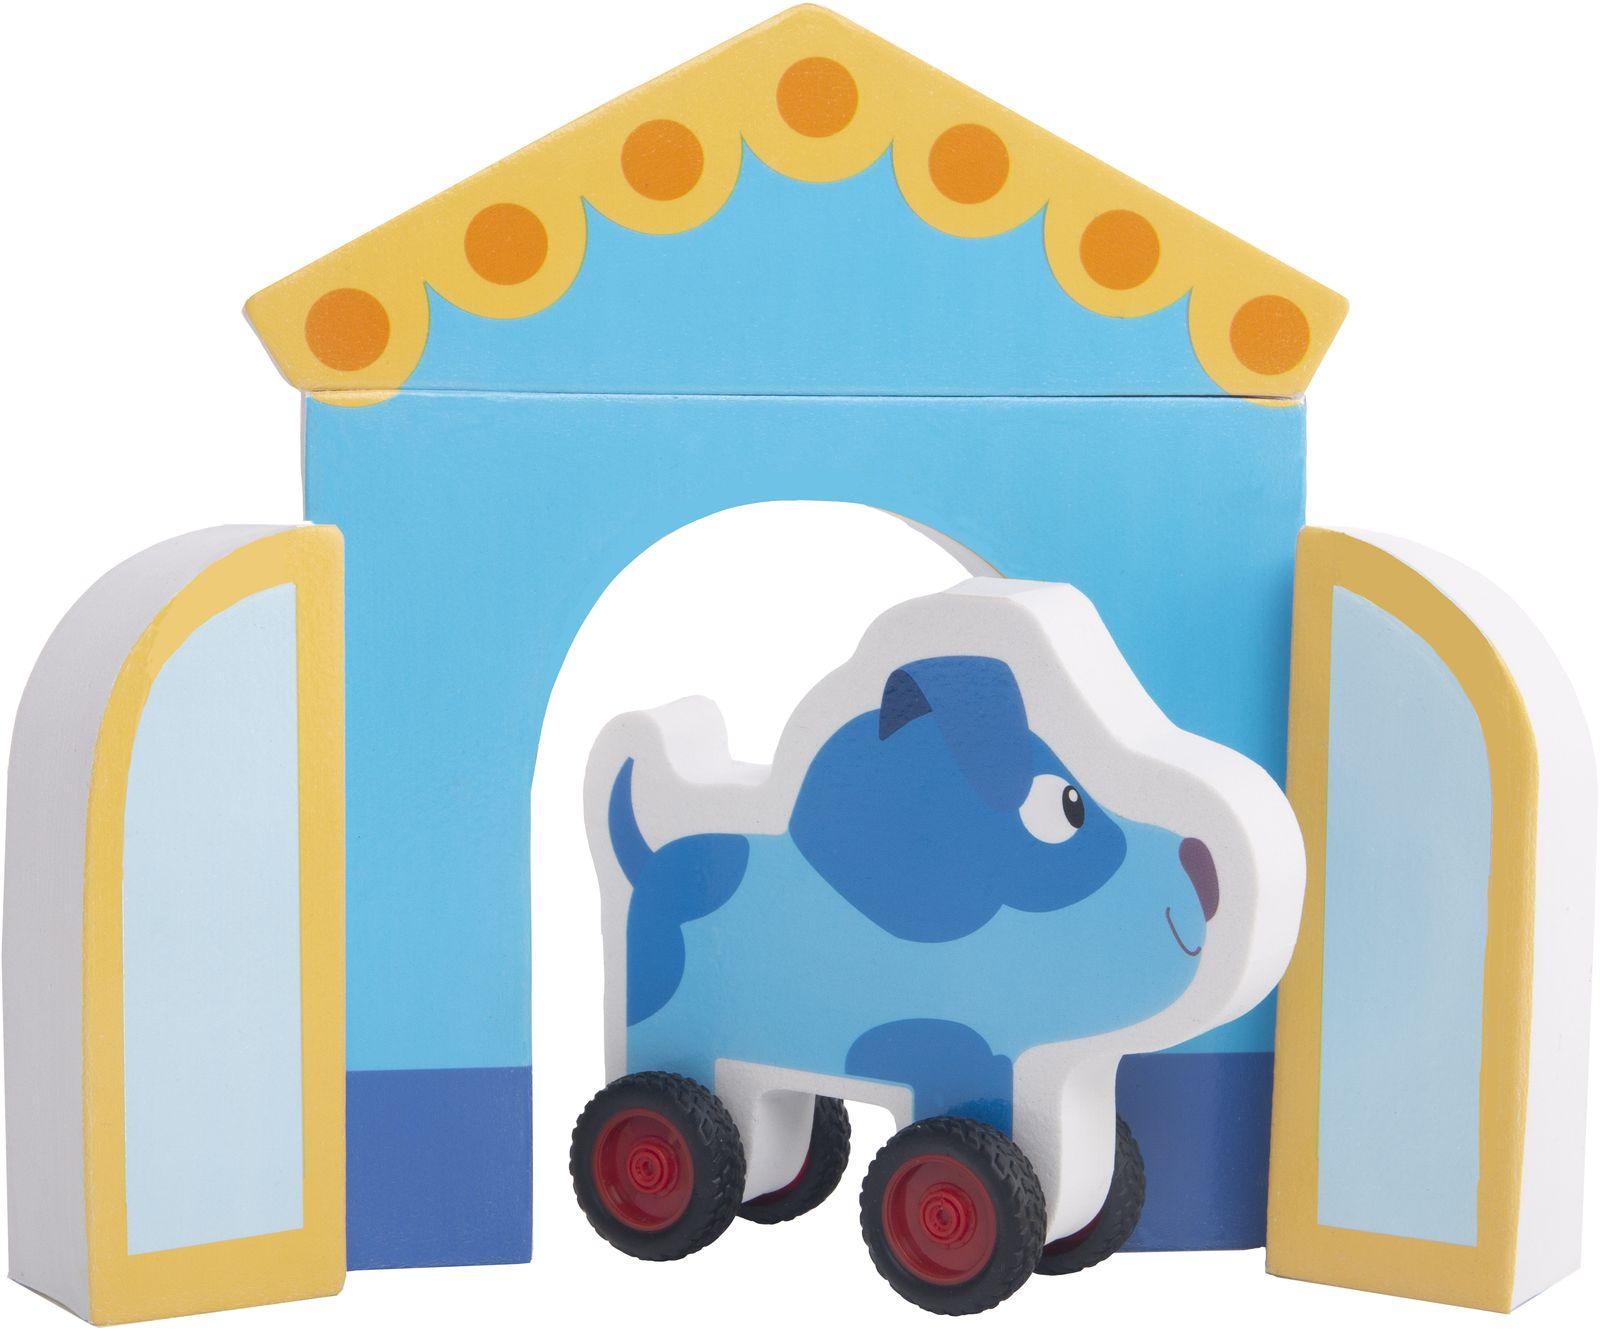 Мягкий конструктор Деревяшки Собачка Гав-Гав, 18WEVA03 набор для творчества конструктор раскраска домик собачка перепл картон с европодвесом